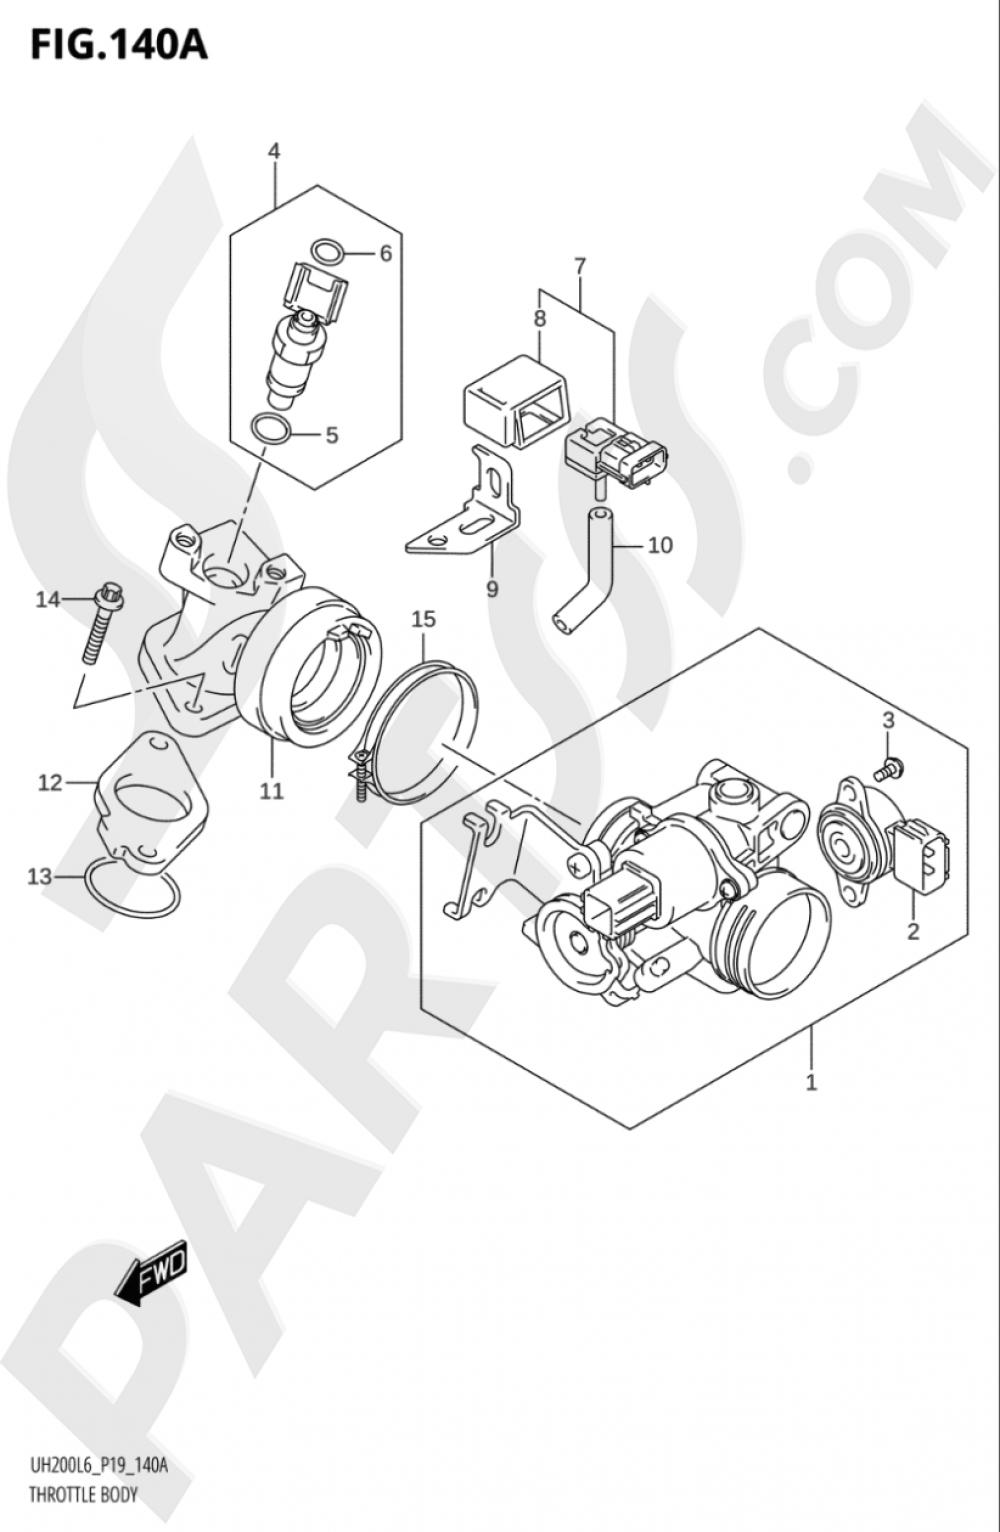 140A - THROTTLE BODY (UH200L6 P19) Suzuki BURGMAN UH200A 2016